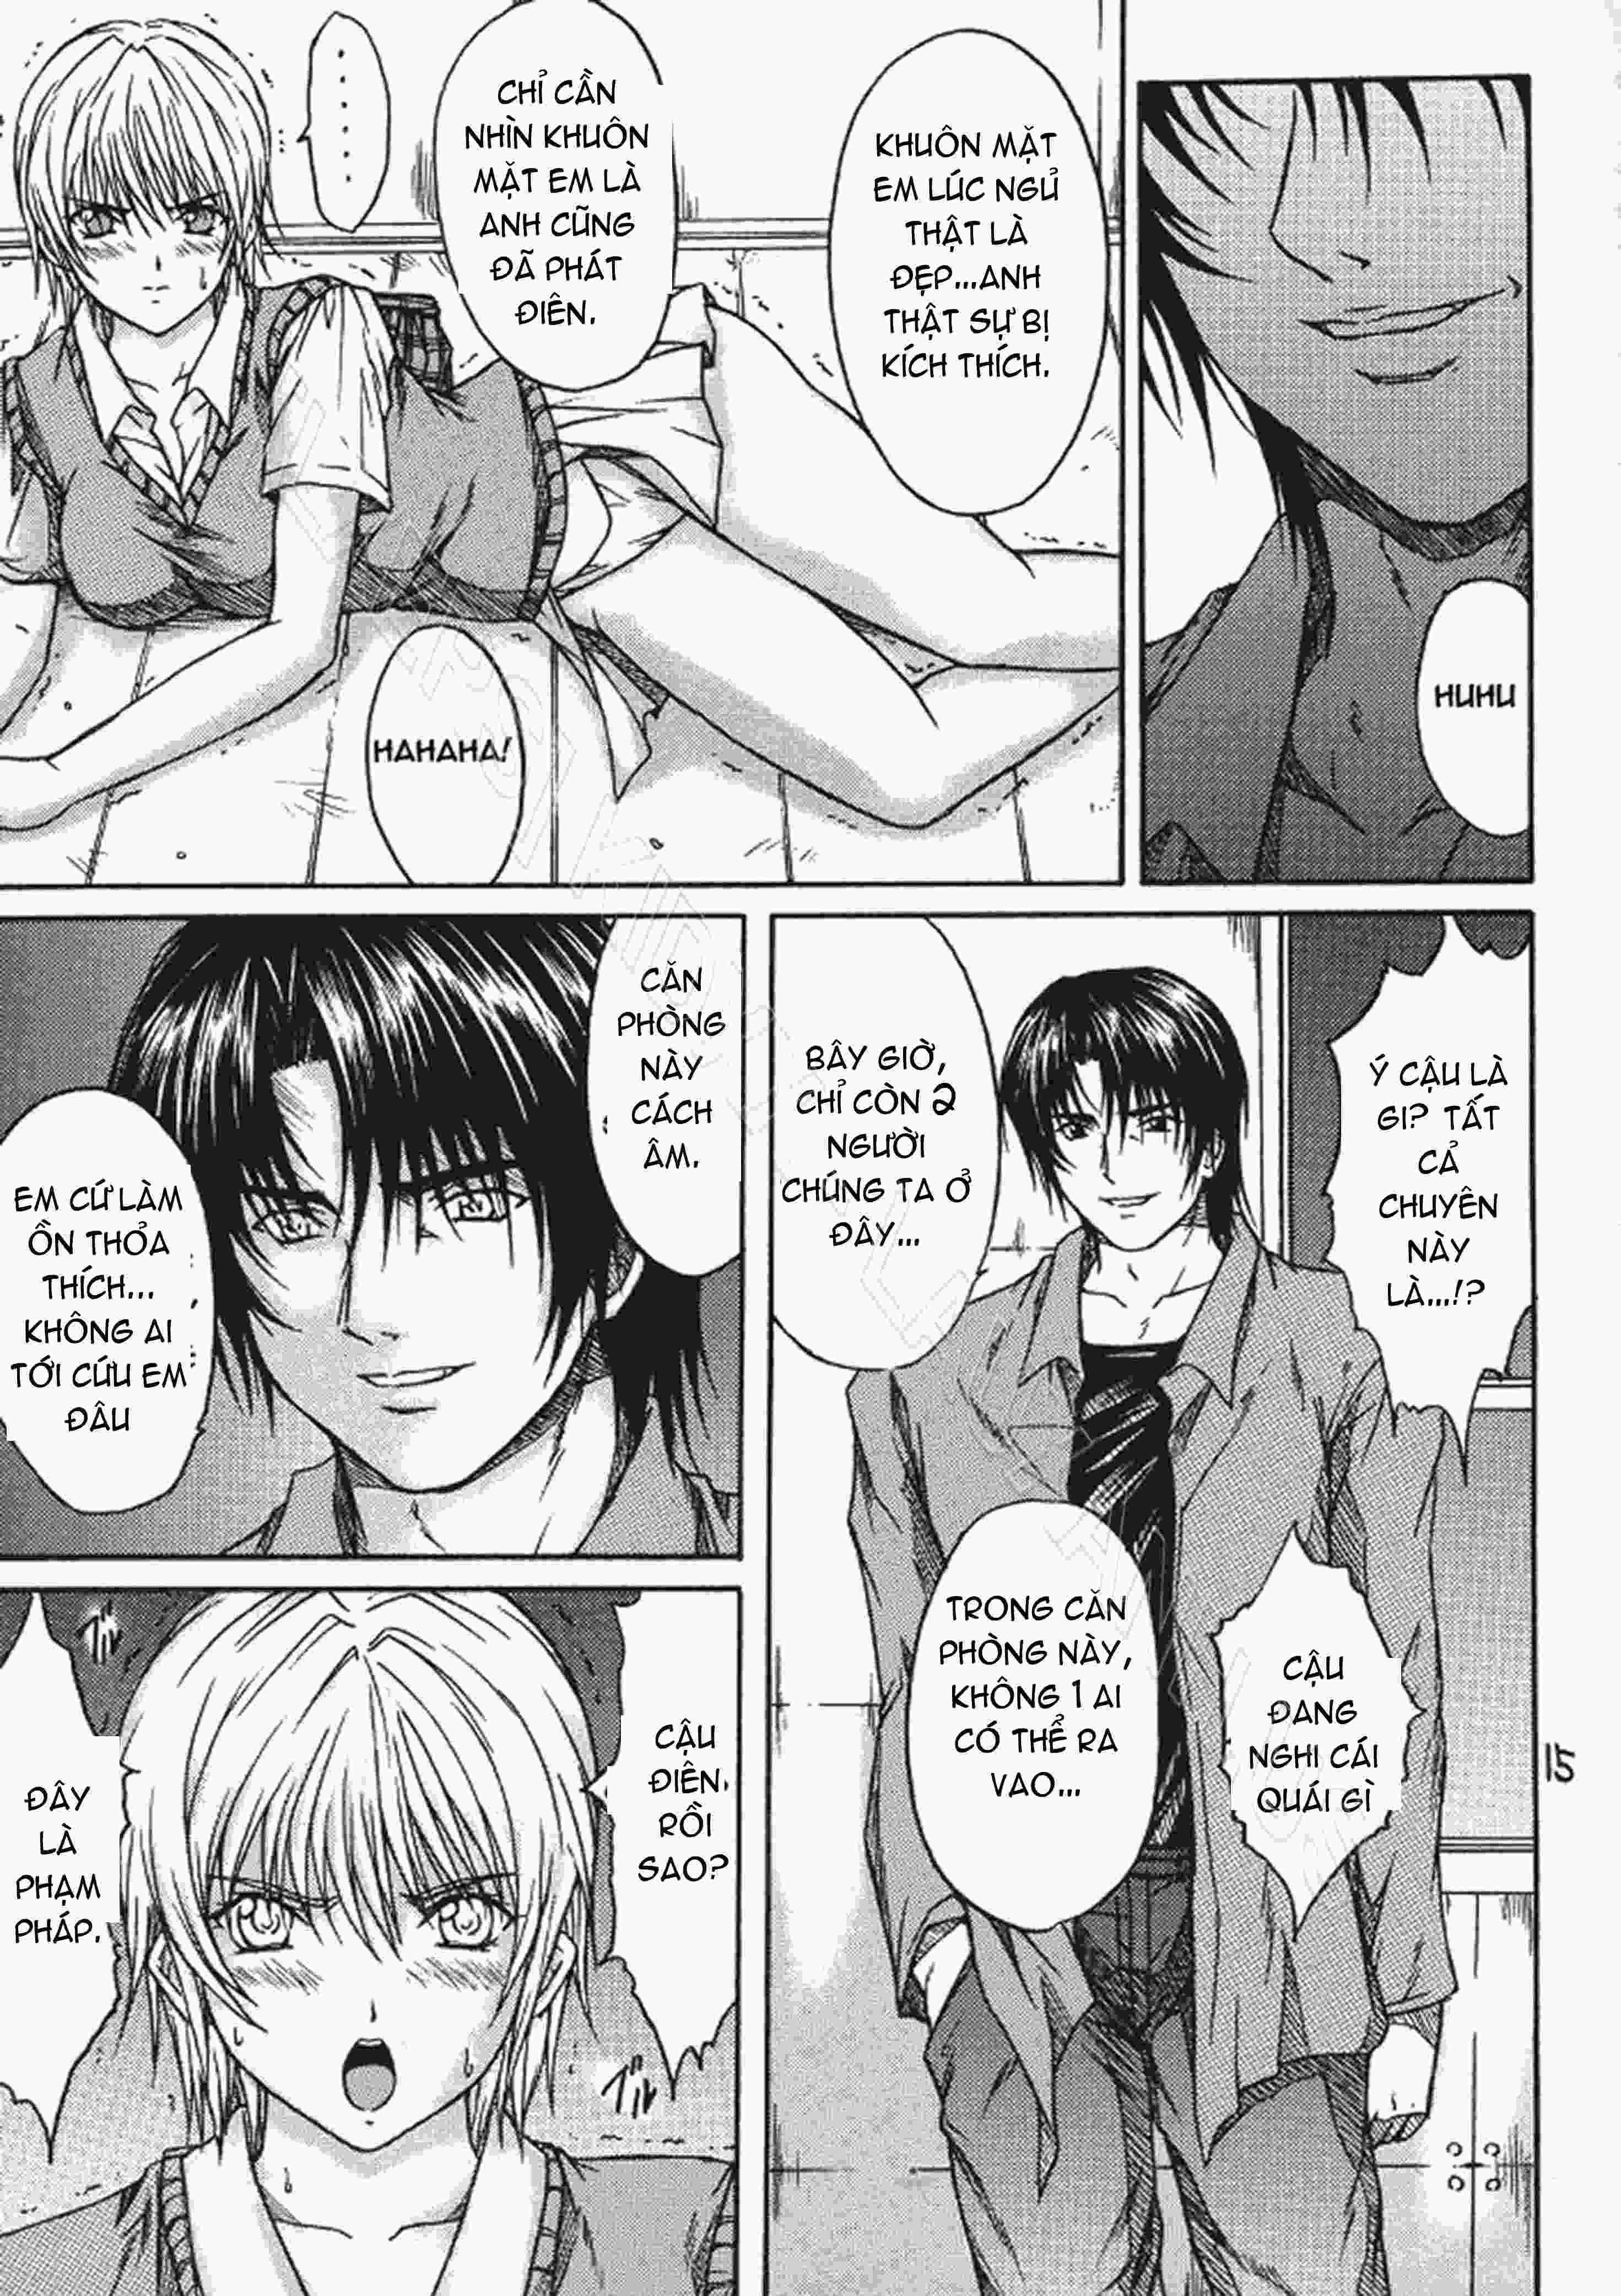 TruyenHay.Com - Ảnh 14 - Ryoujoku Rensa Chapter 3